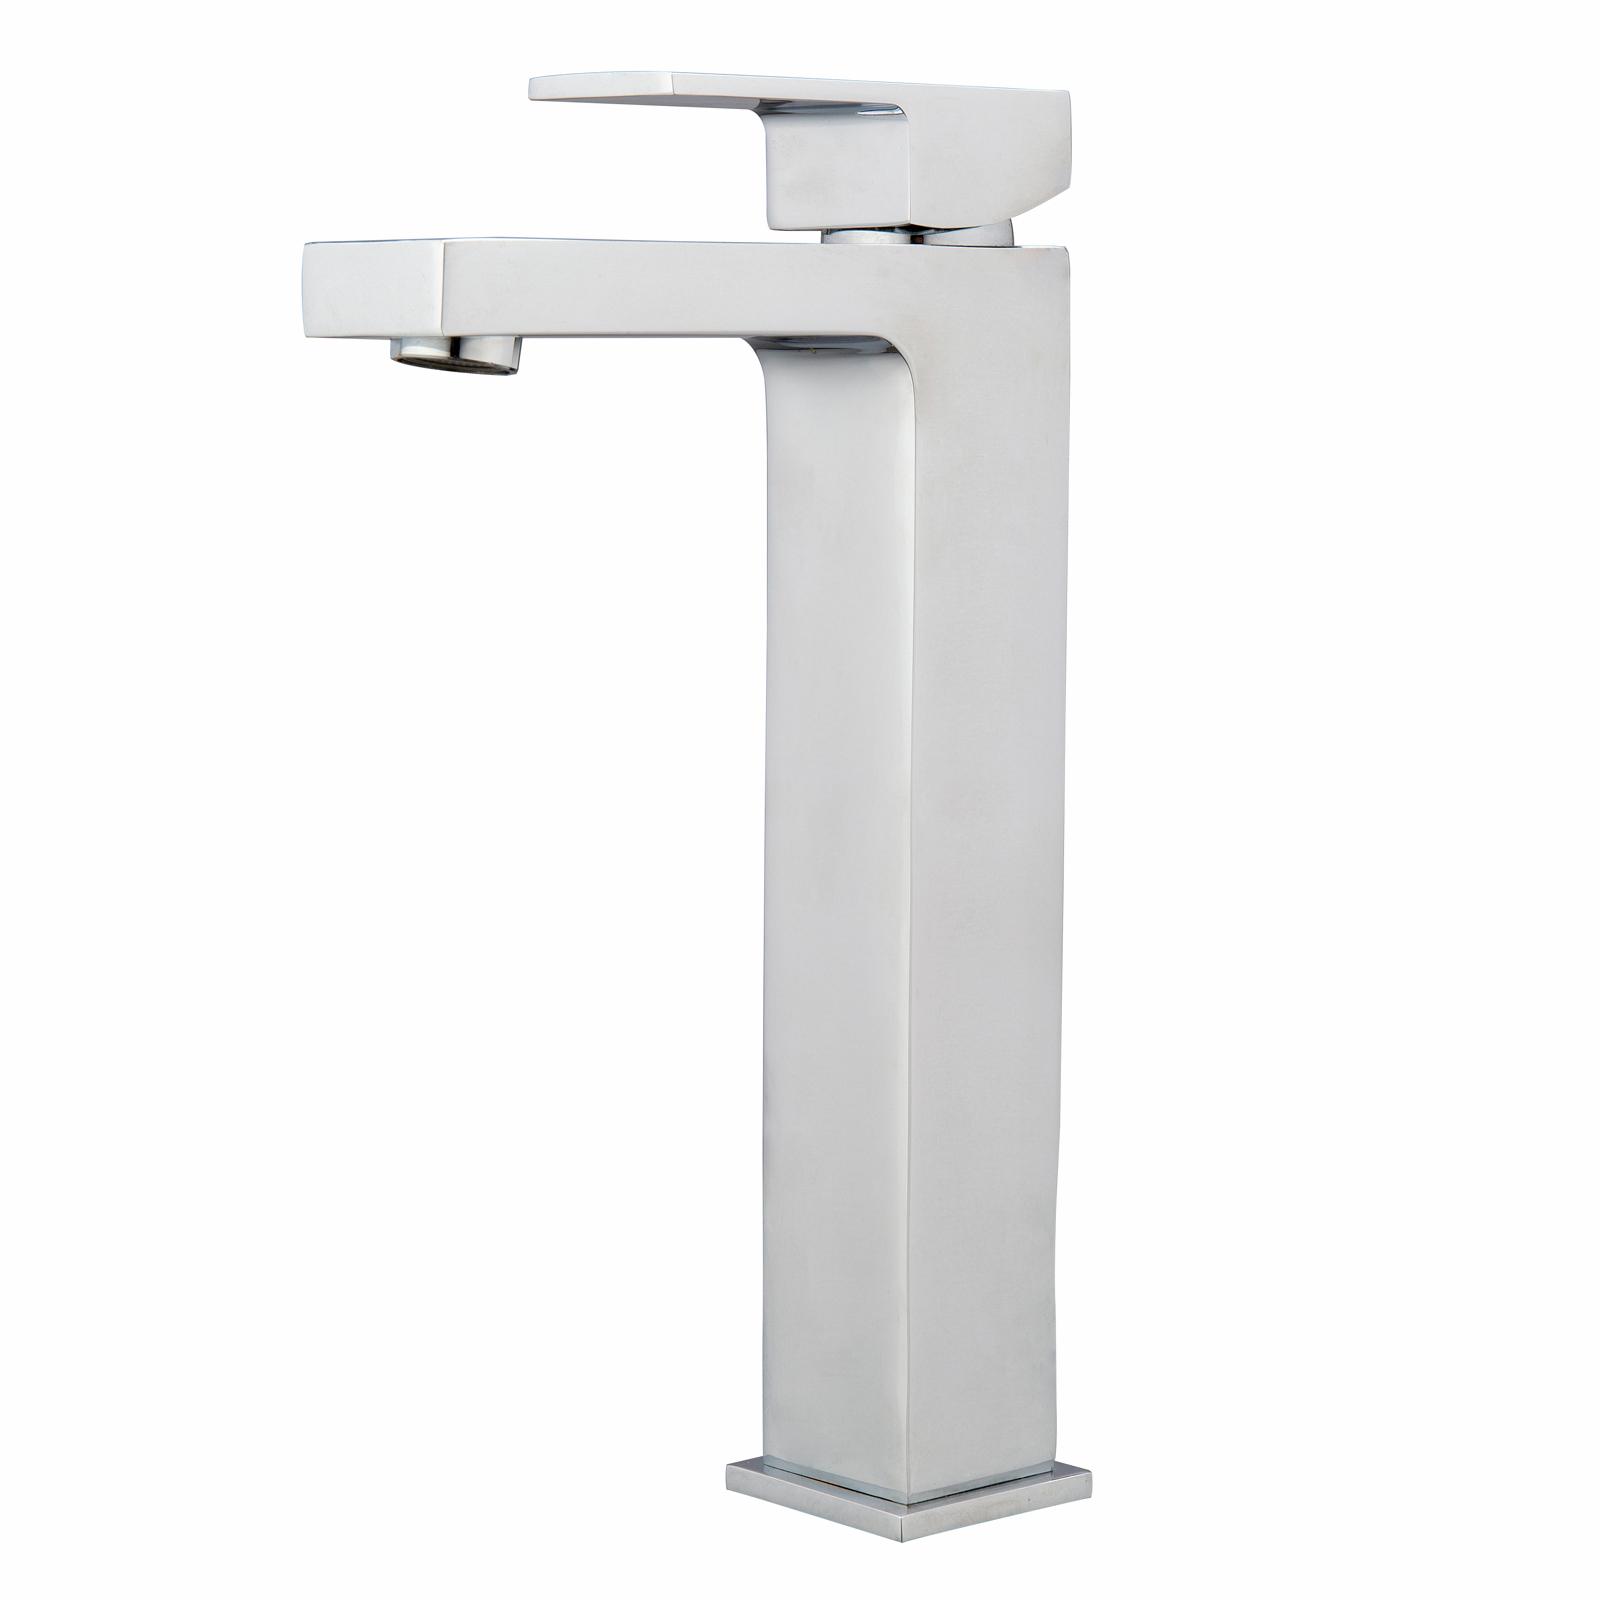 Mondella Chrome Rococo Tall Basin Mixer - Suitable For Unequal / Mains Pressure